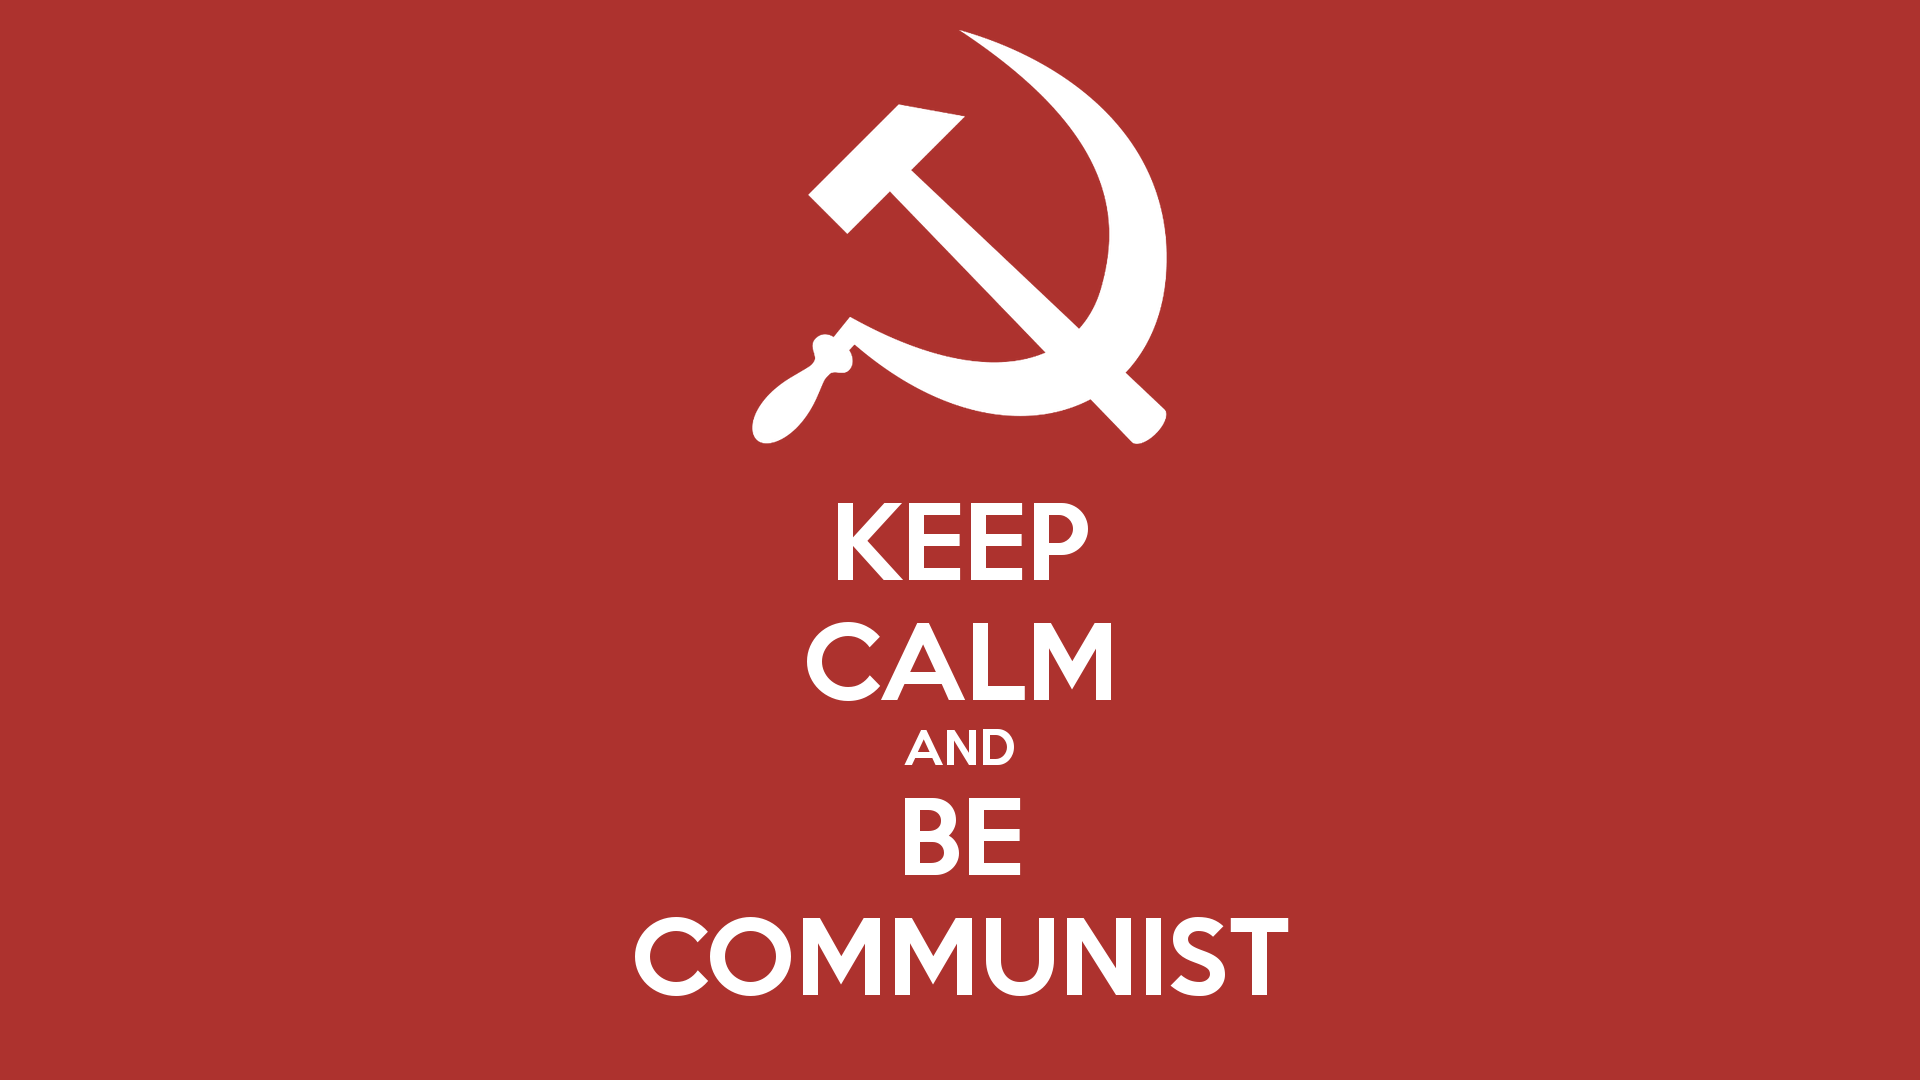 Картинка на рабочий стол коммунизм